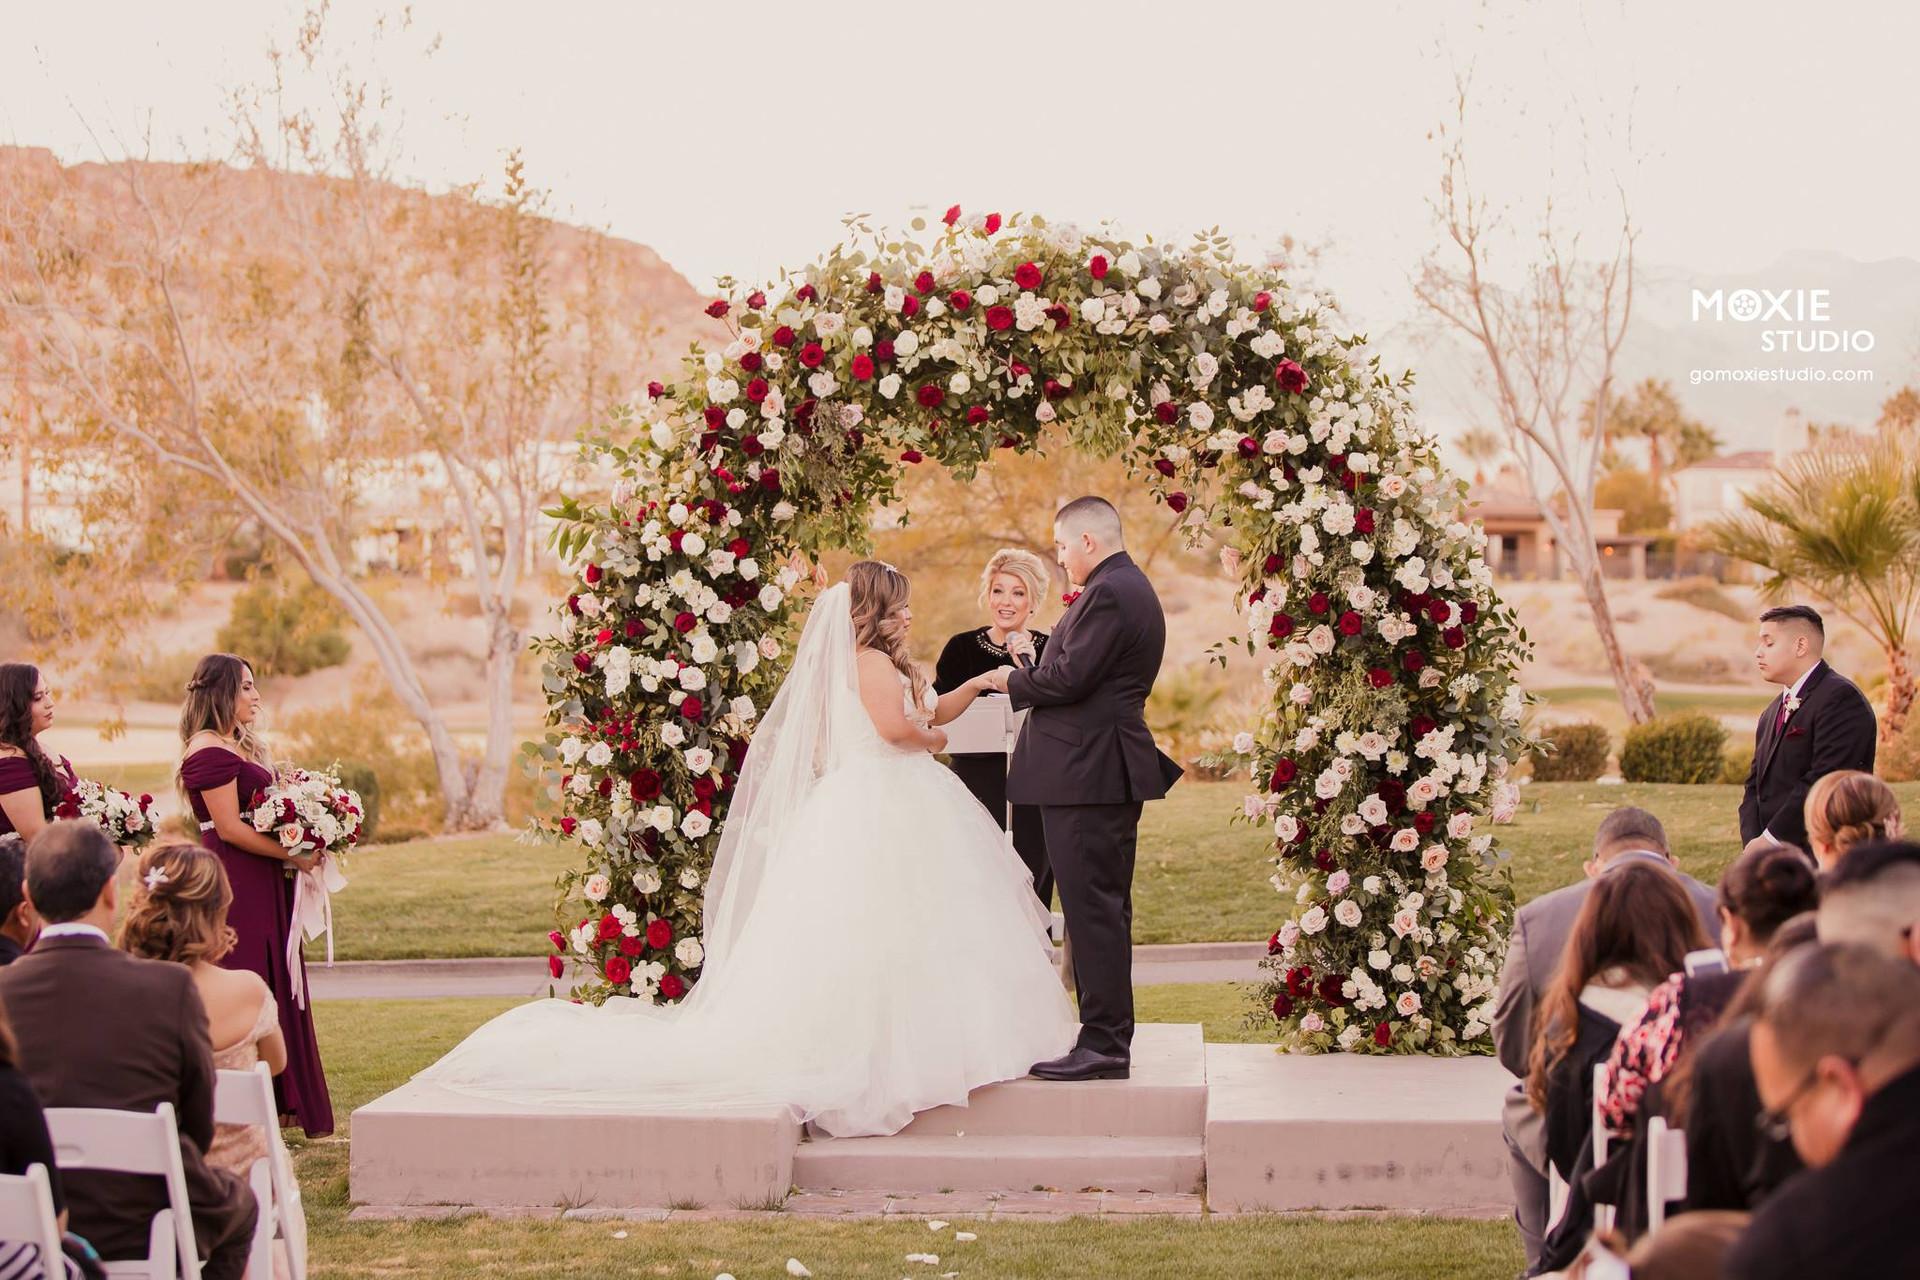 Burgundy and bush wedding ceremony at Red Rock Country Club, Las Vegas, NV. Photo: Moxie Studio